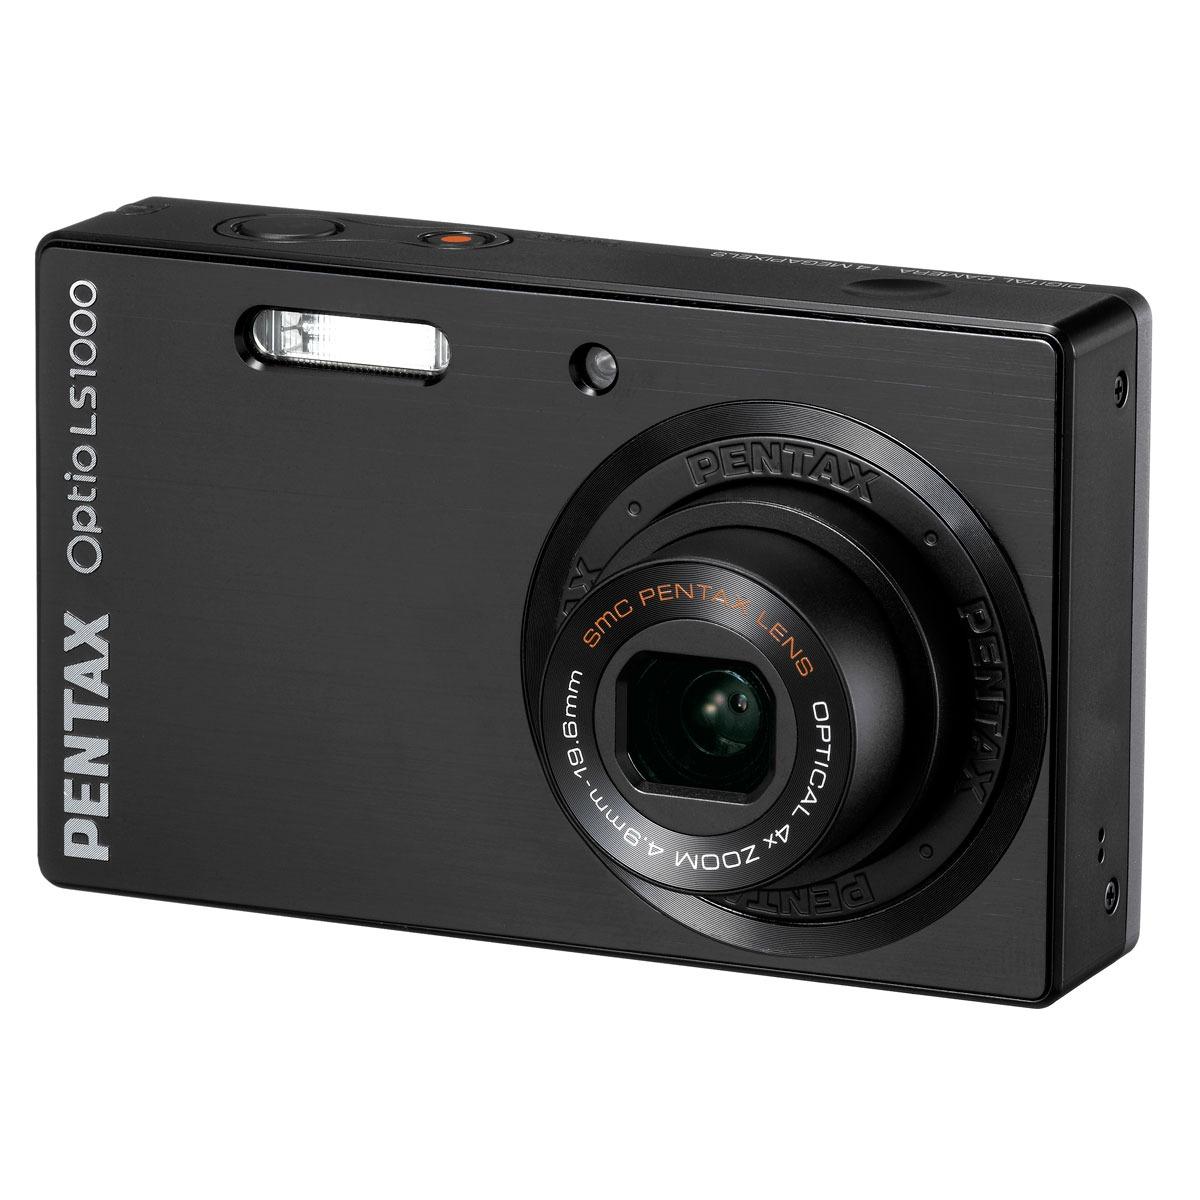 pentax optio ls1000 noir appareil photo num rique pentax. Black Bedroom Furniture Sets. Home Design Ideas